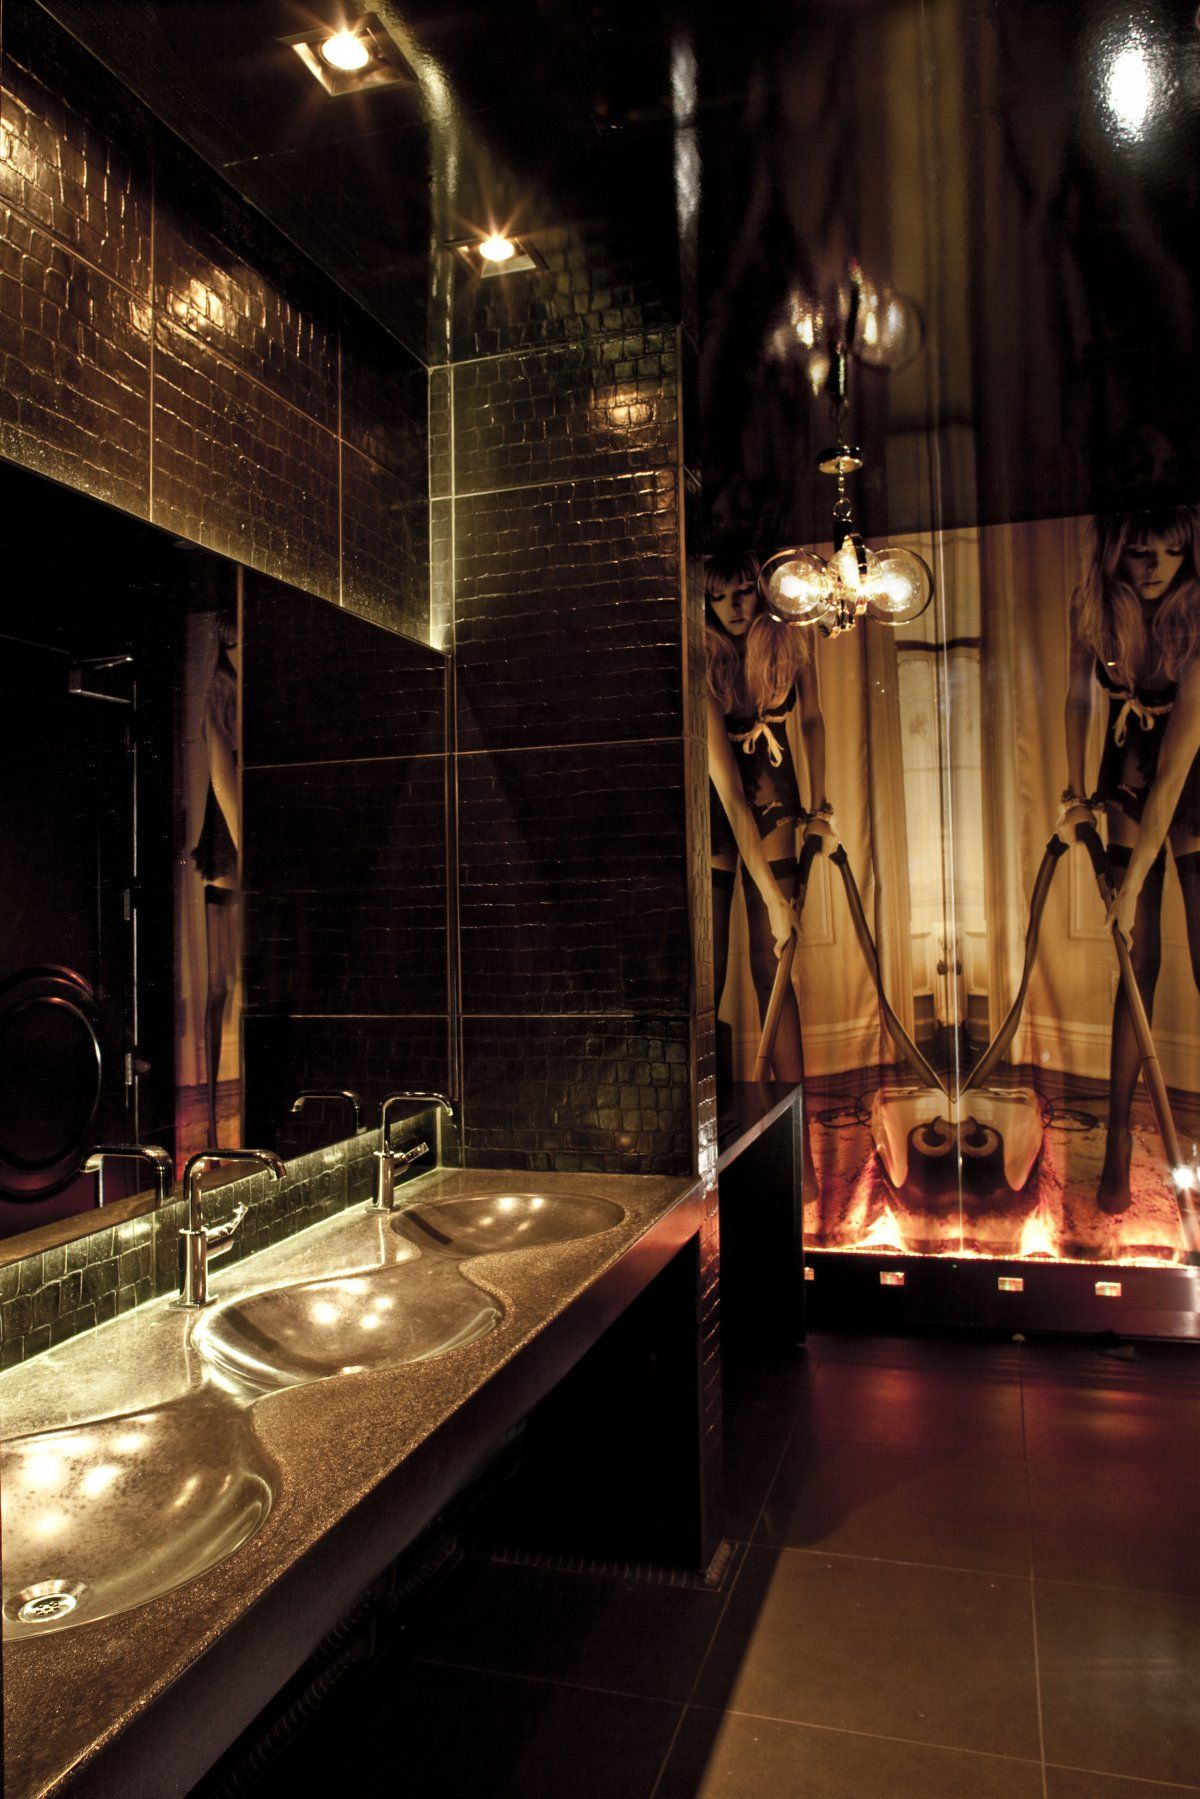 Cool Bathrooms Nyc the 10 best public bathrooms in america | flat screen, vanities